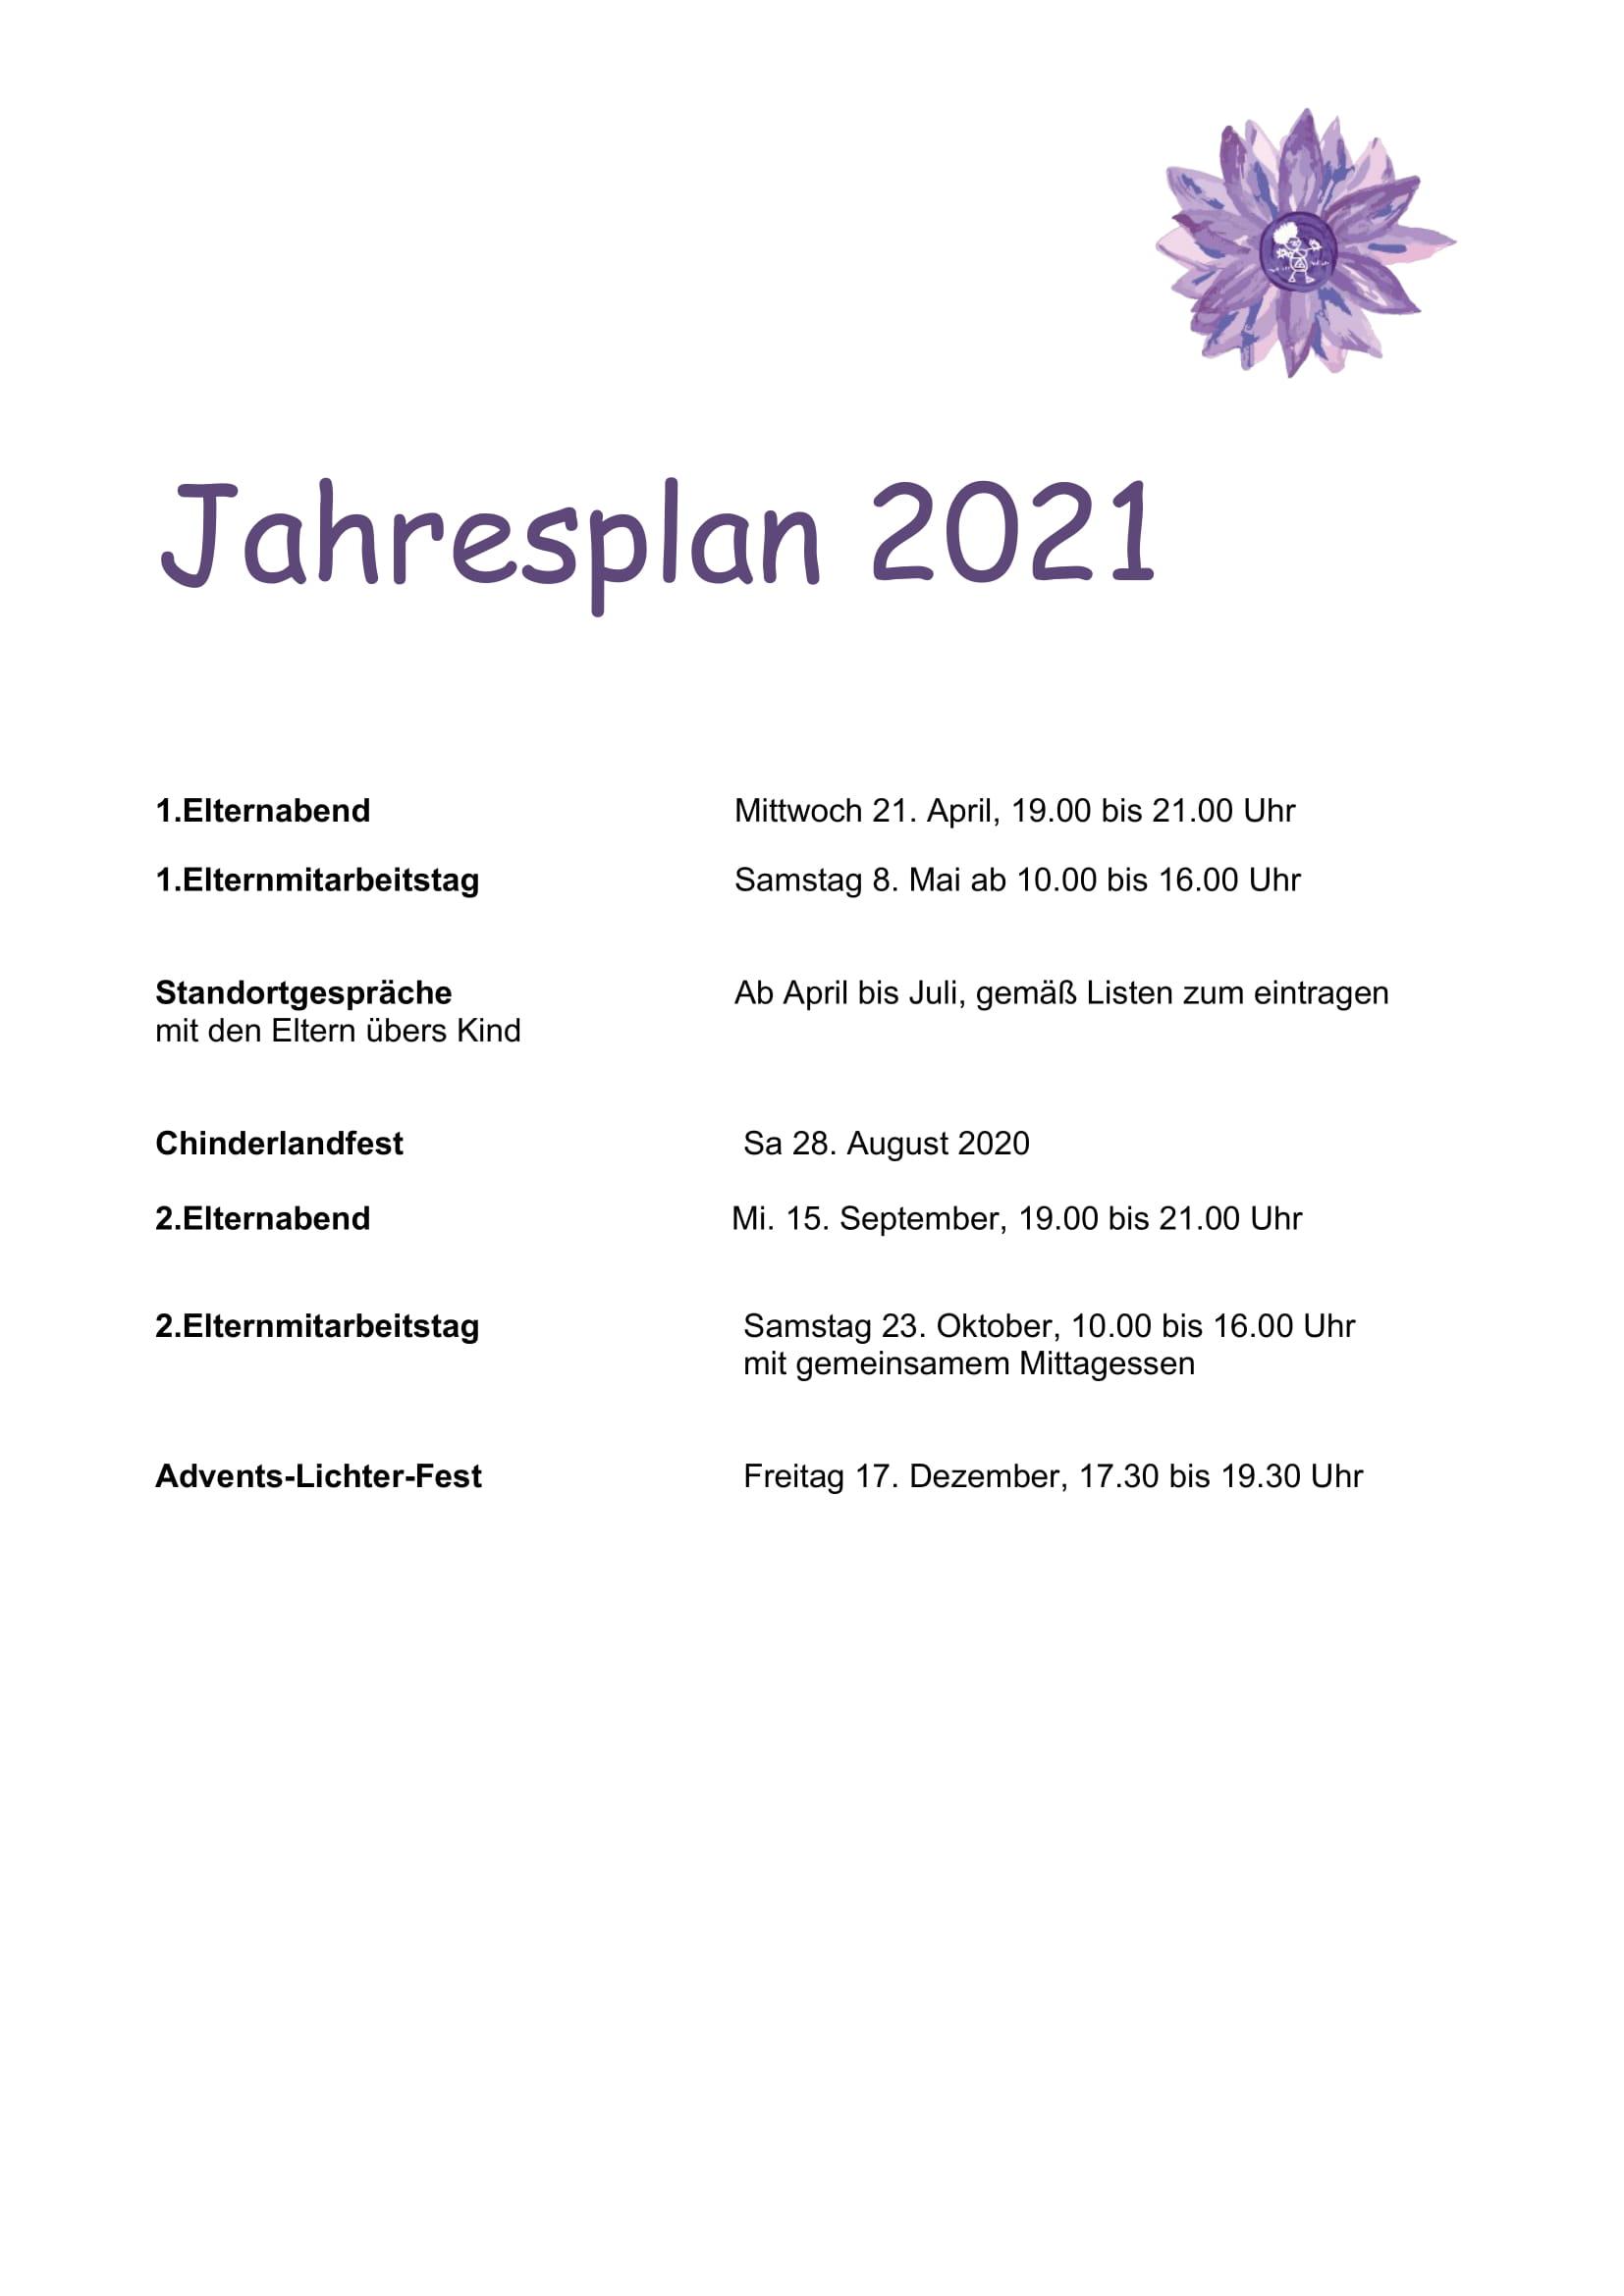 Jahresplan 2021 Dotzigen-1